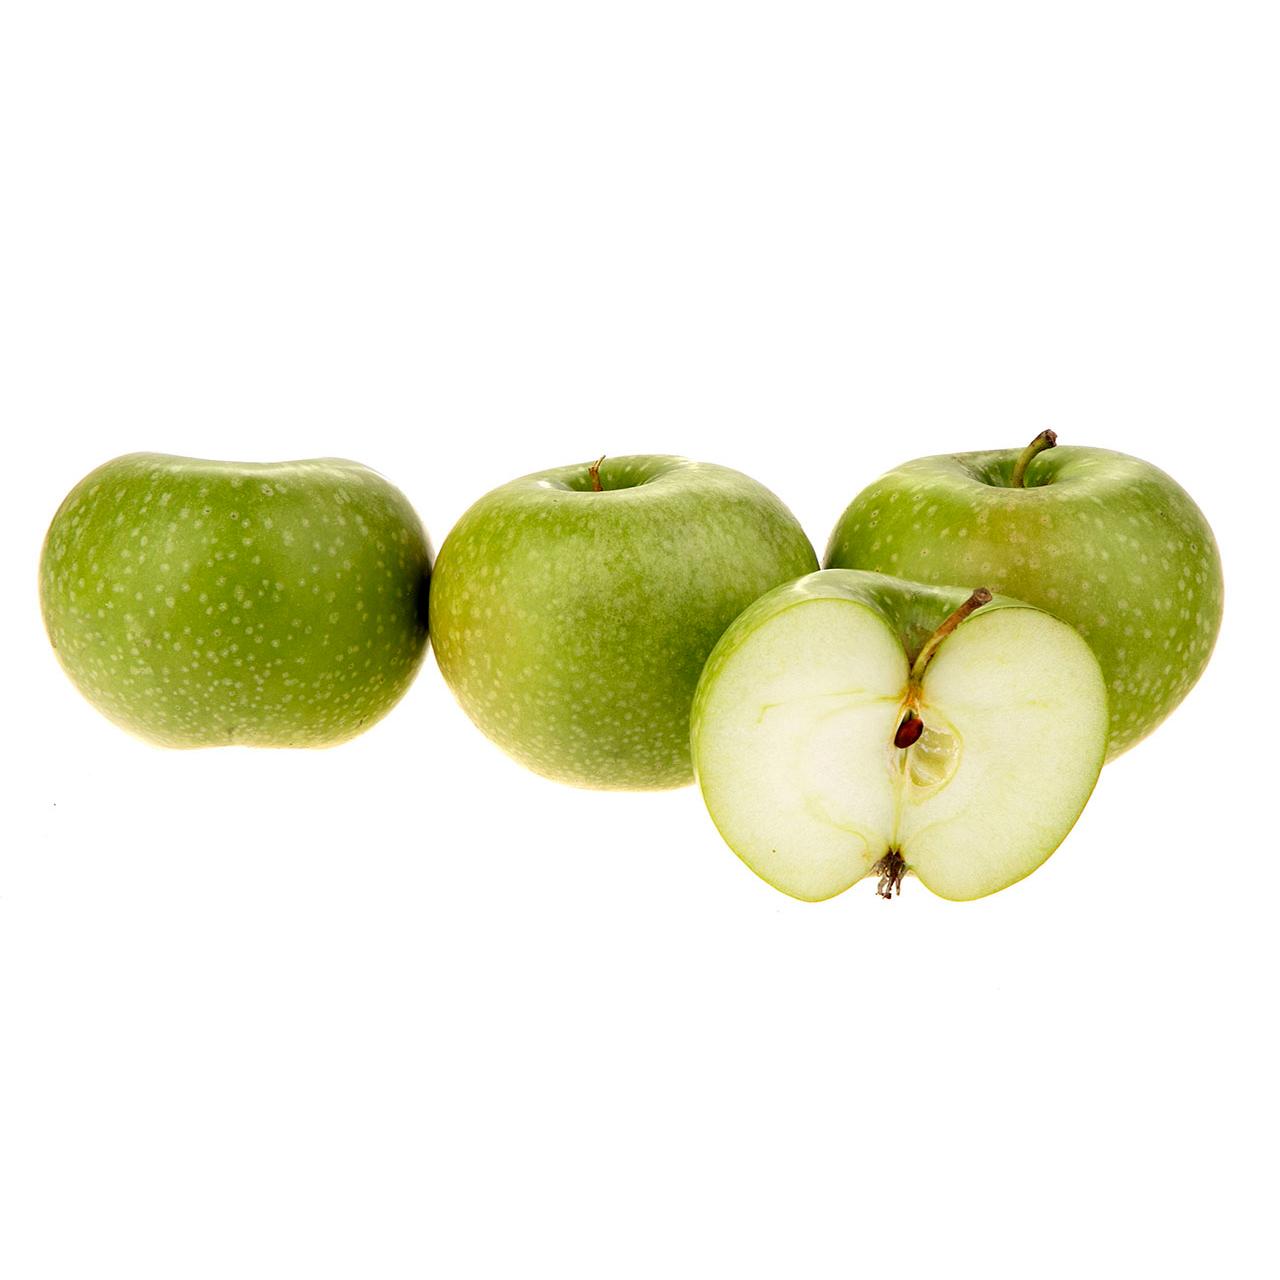 سیب سبز - 1 کیلوگرم